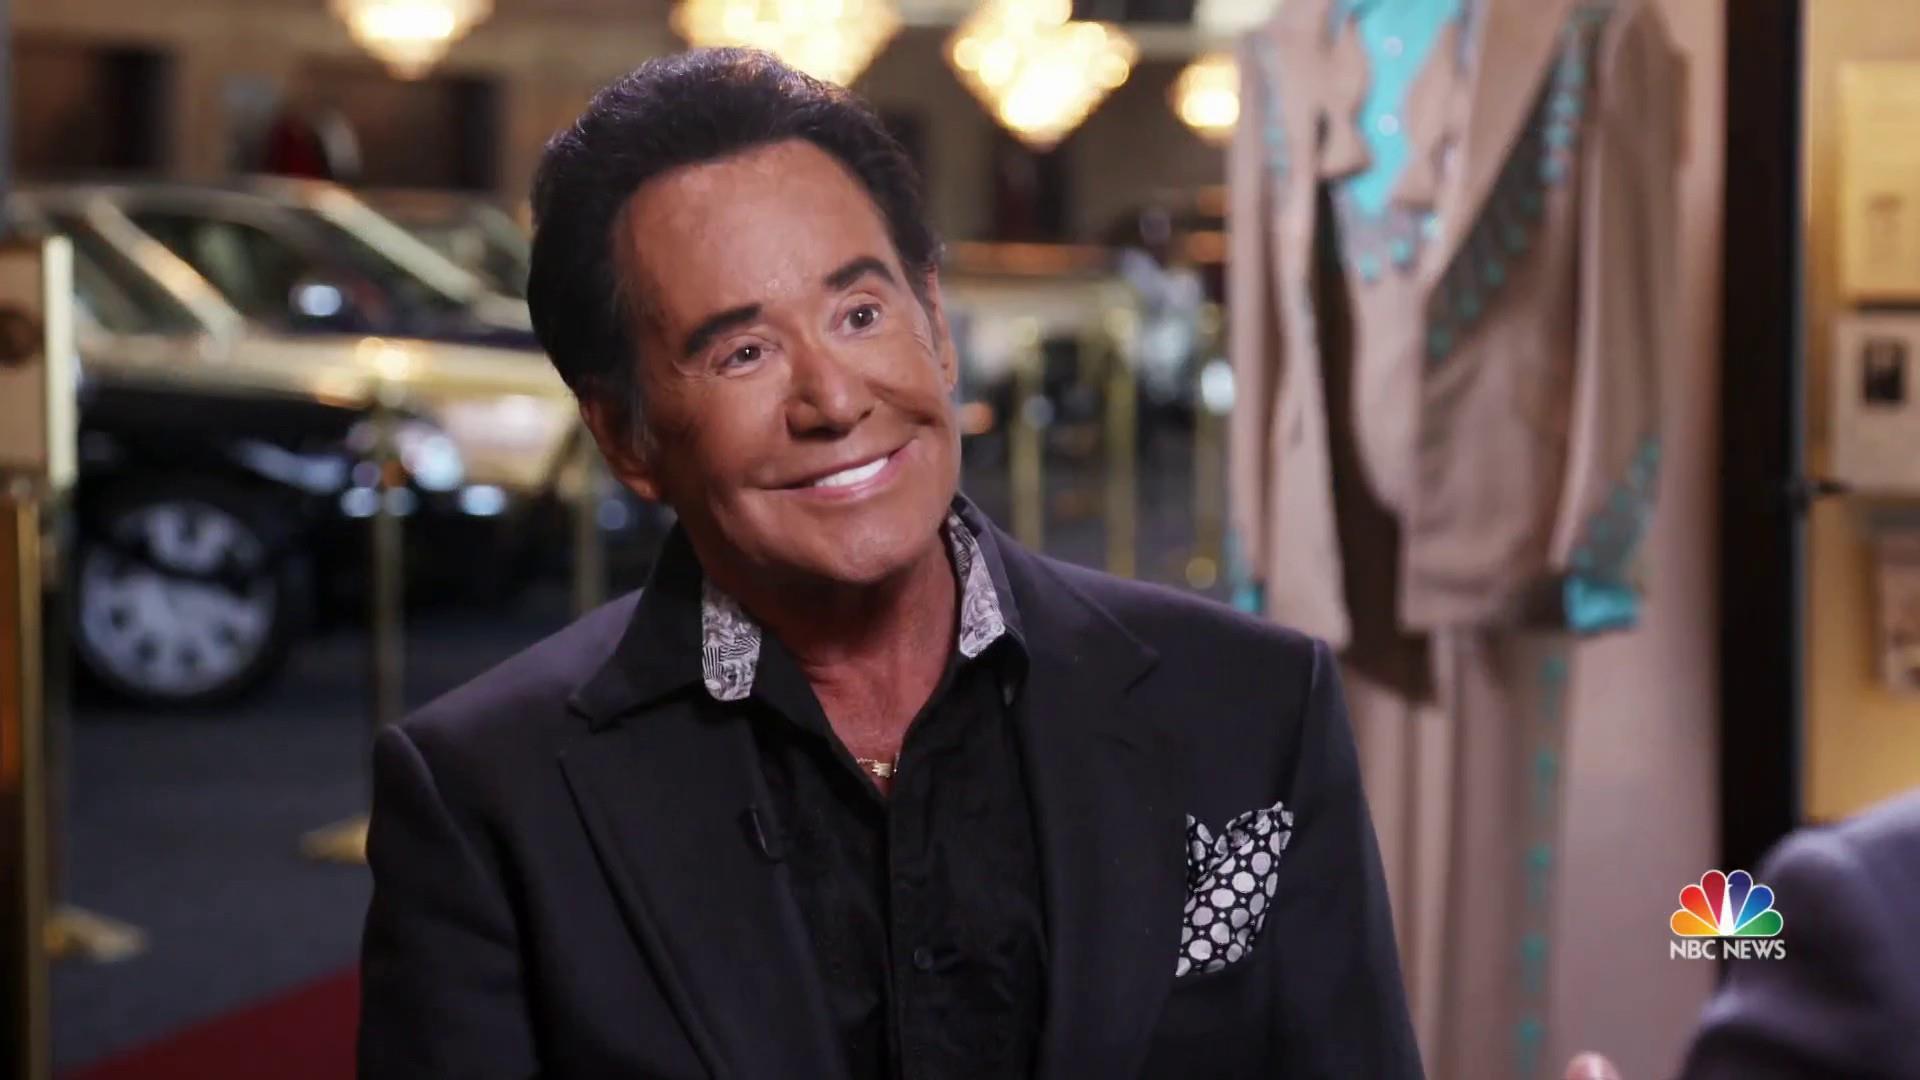 Wayne Newton celebrating six decades of entertaining audiences in Las Vegas